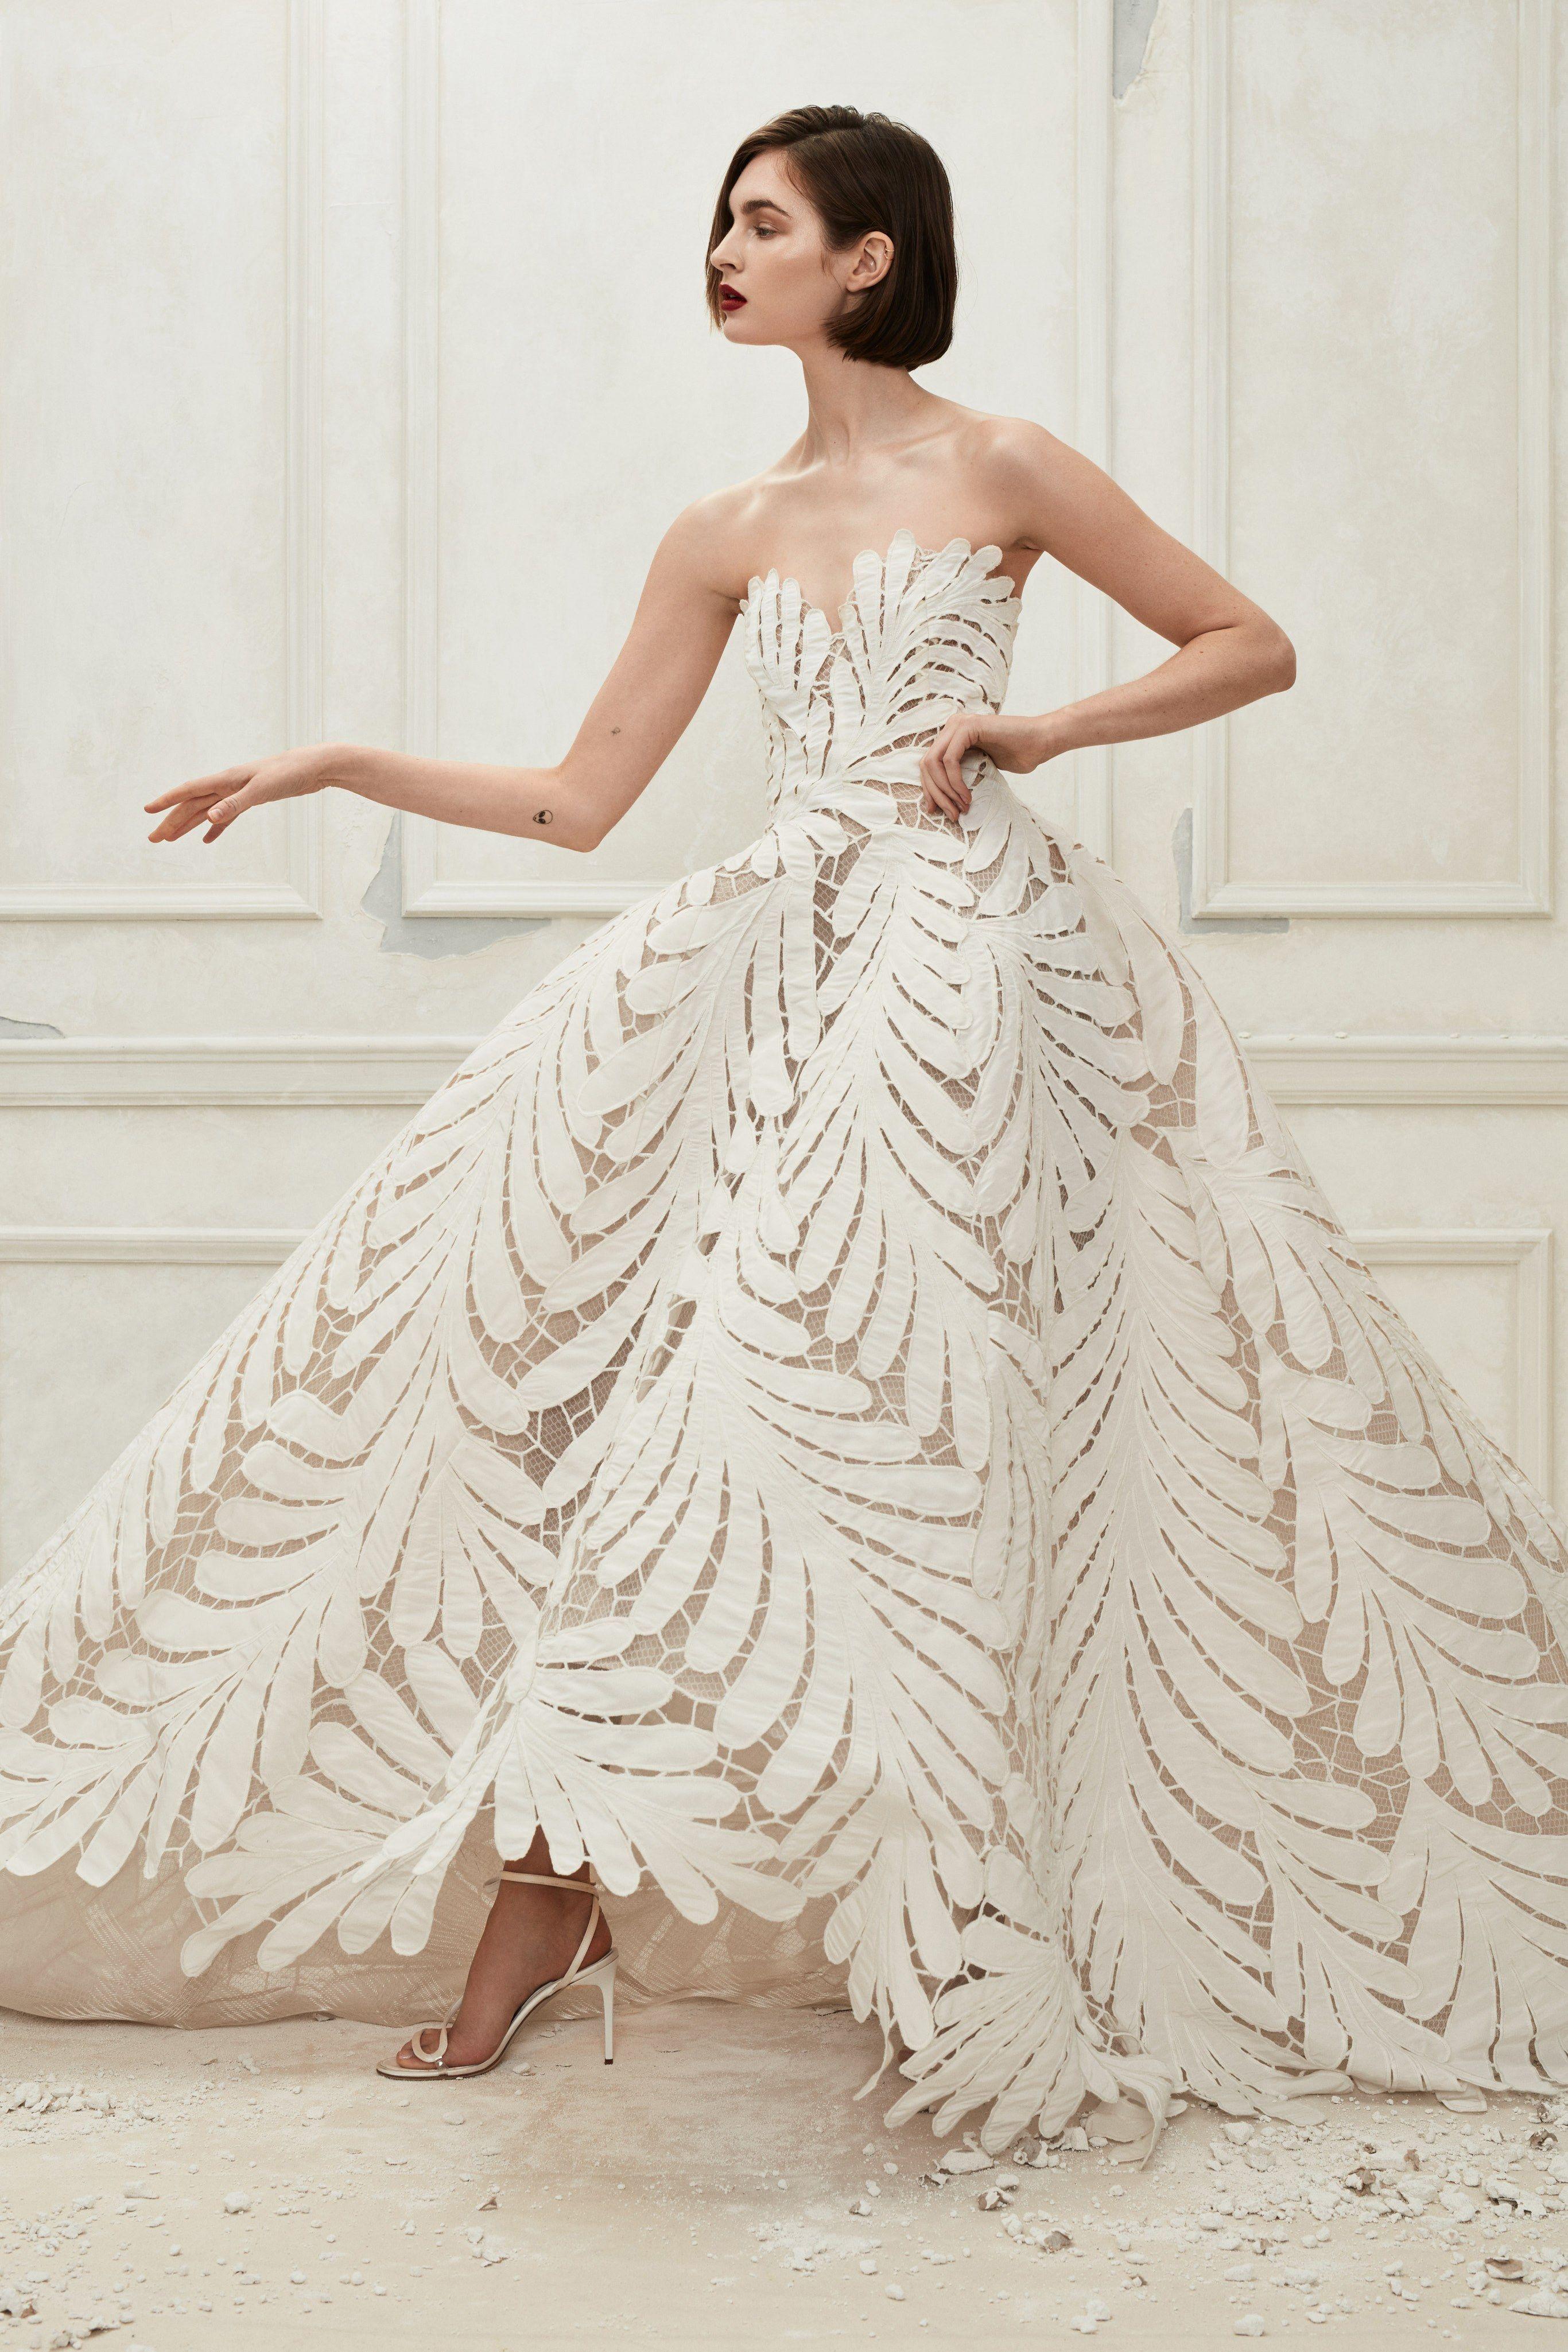 Silver wedding dresses plus size  Oscar de la Renta Bridal Fall   Just Bridal  Pinterest